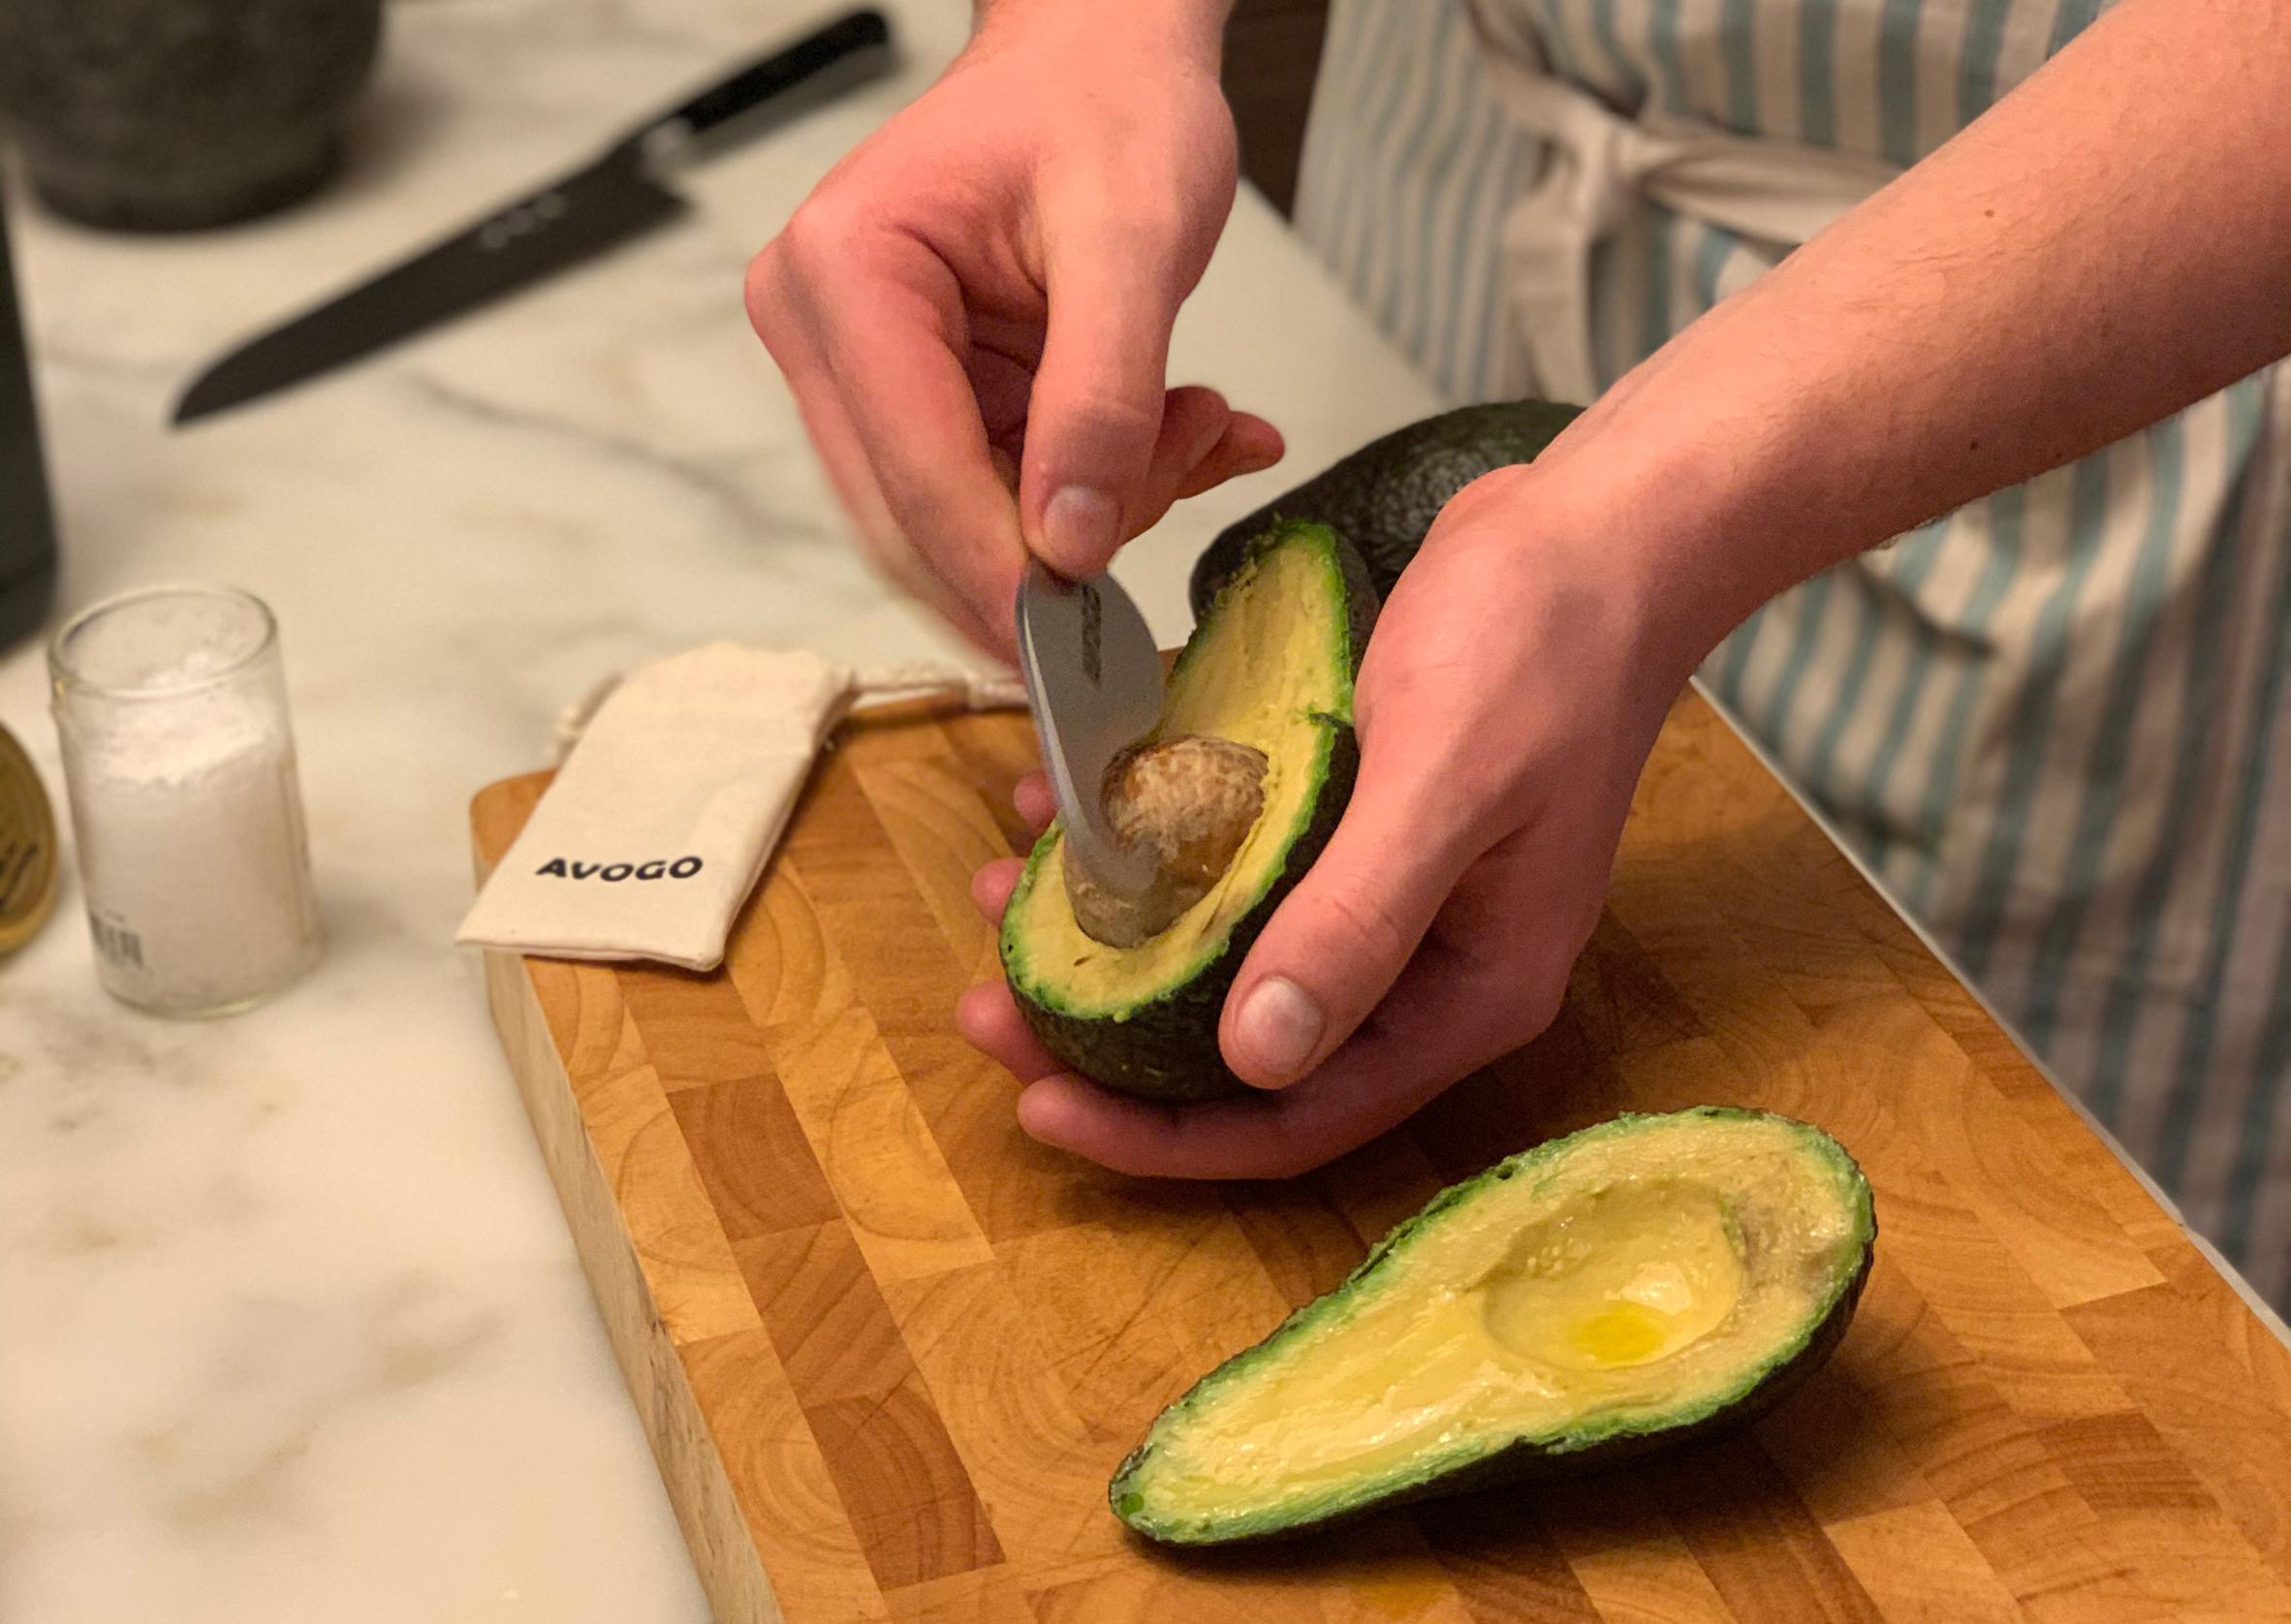 Avogo travel-sized avocado cutter in use